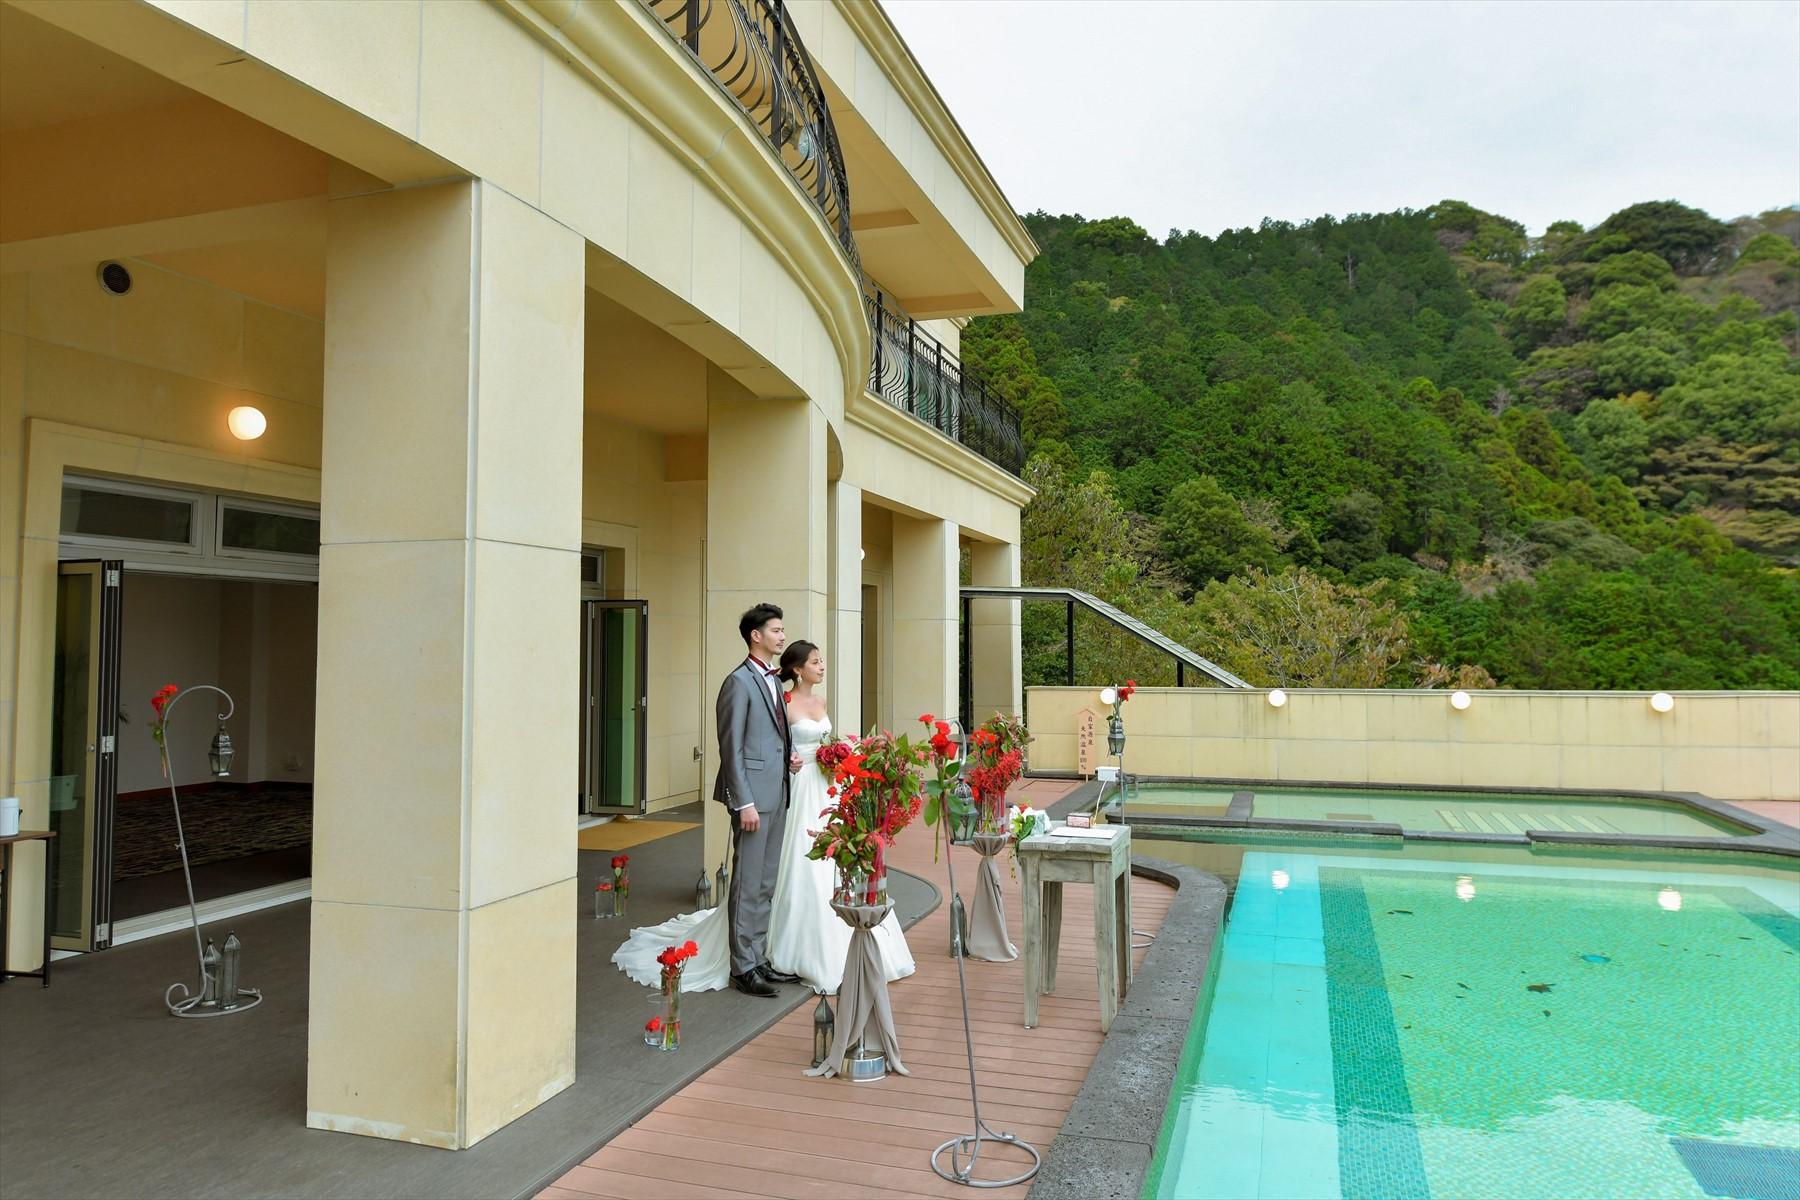 静岡邸宅貸切ウェディング 静岡結婚式場 家族婚